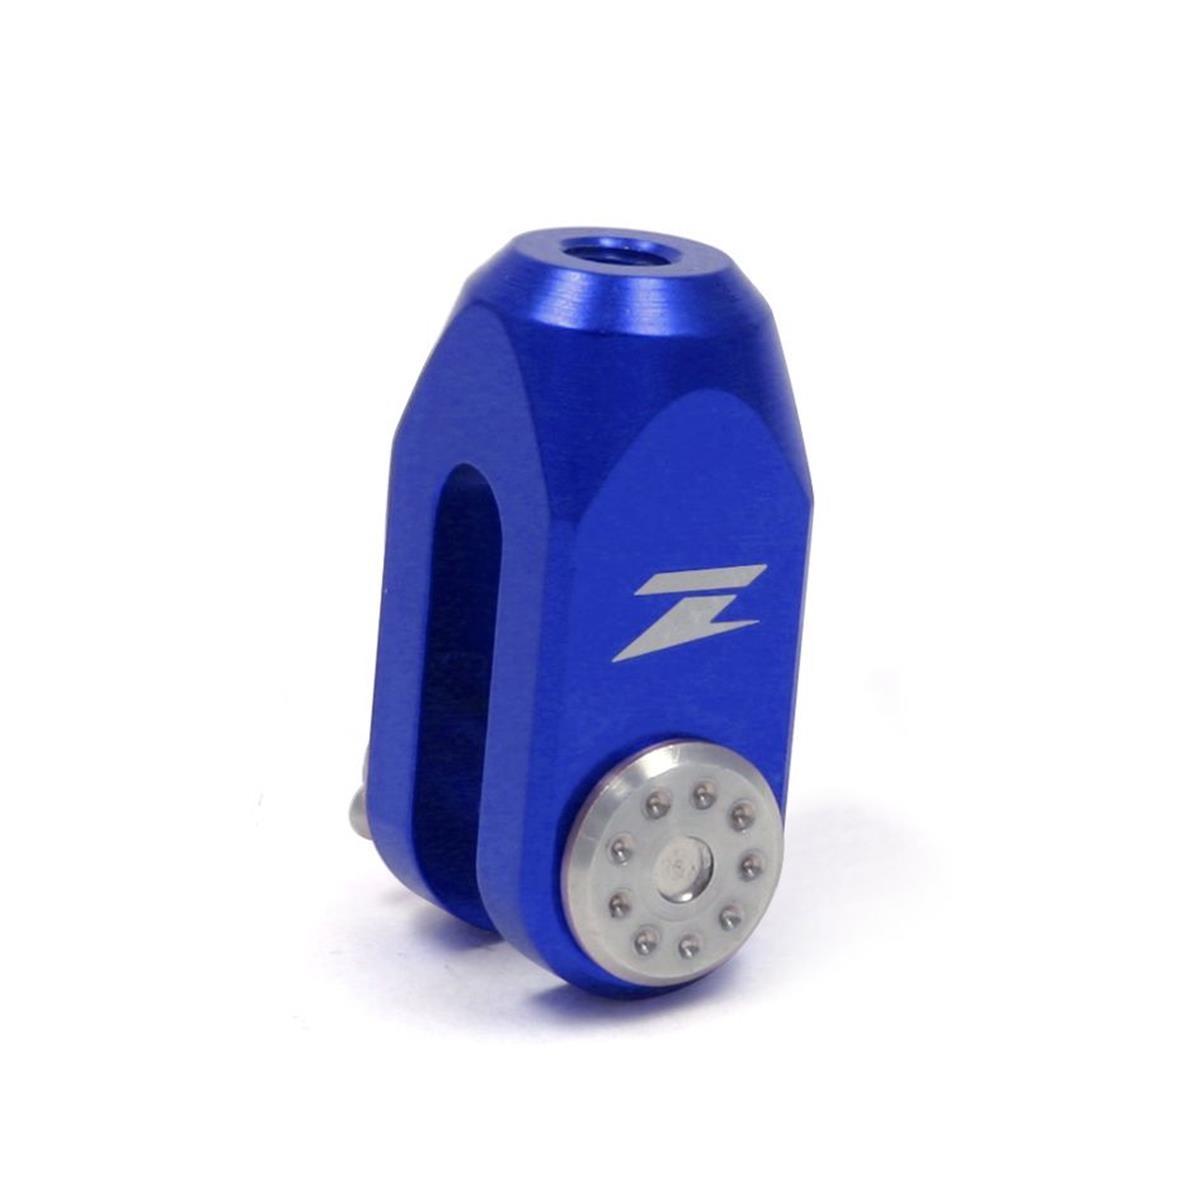 Zeta Hinterradbremsen-Einsteller  Blau, Yamaha YZ 80/85 94-17